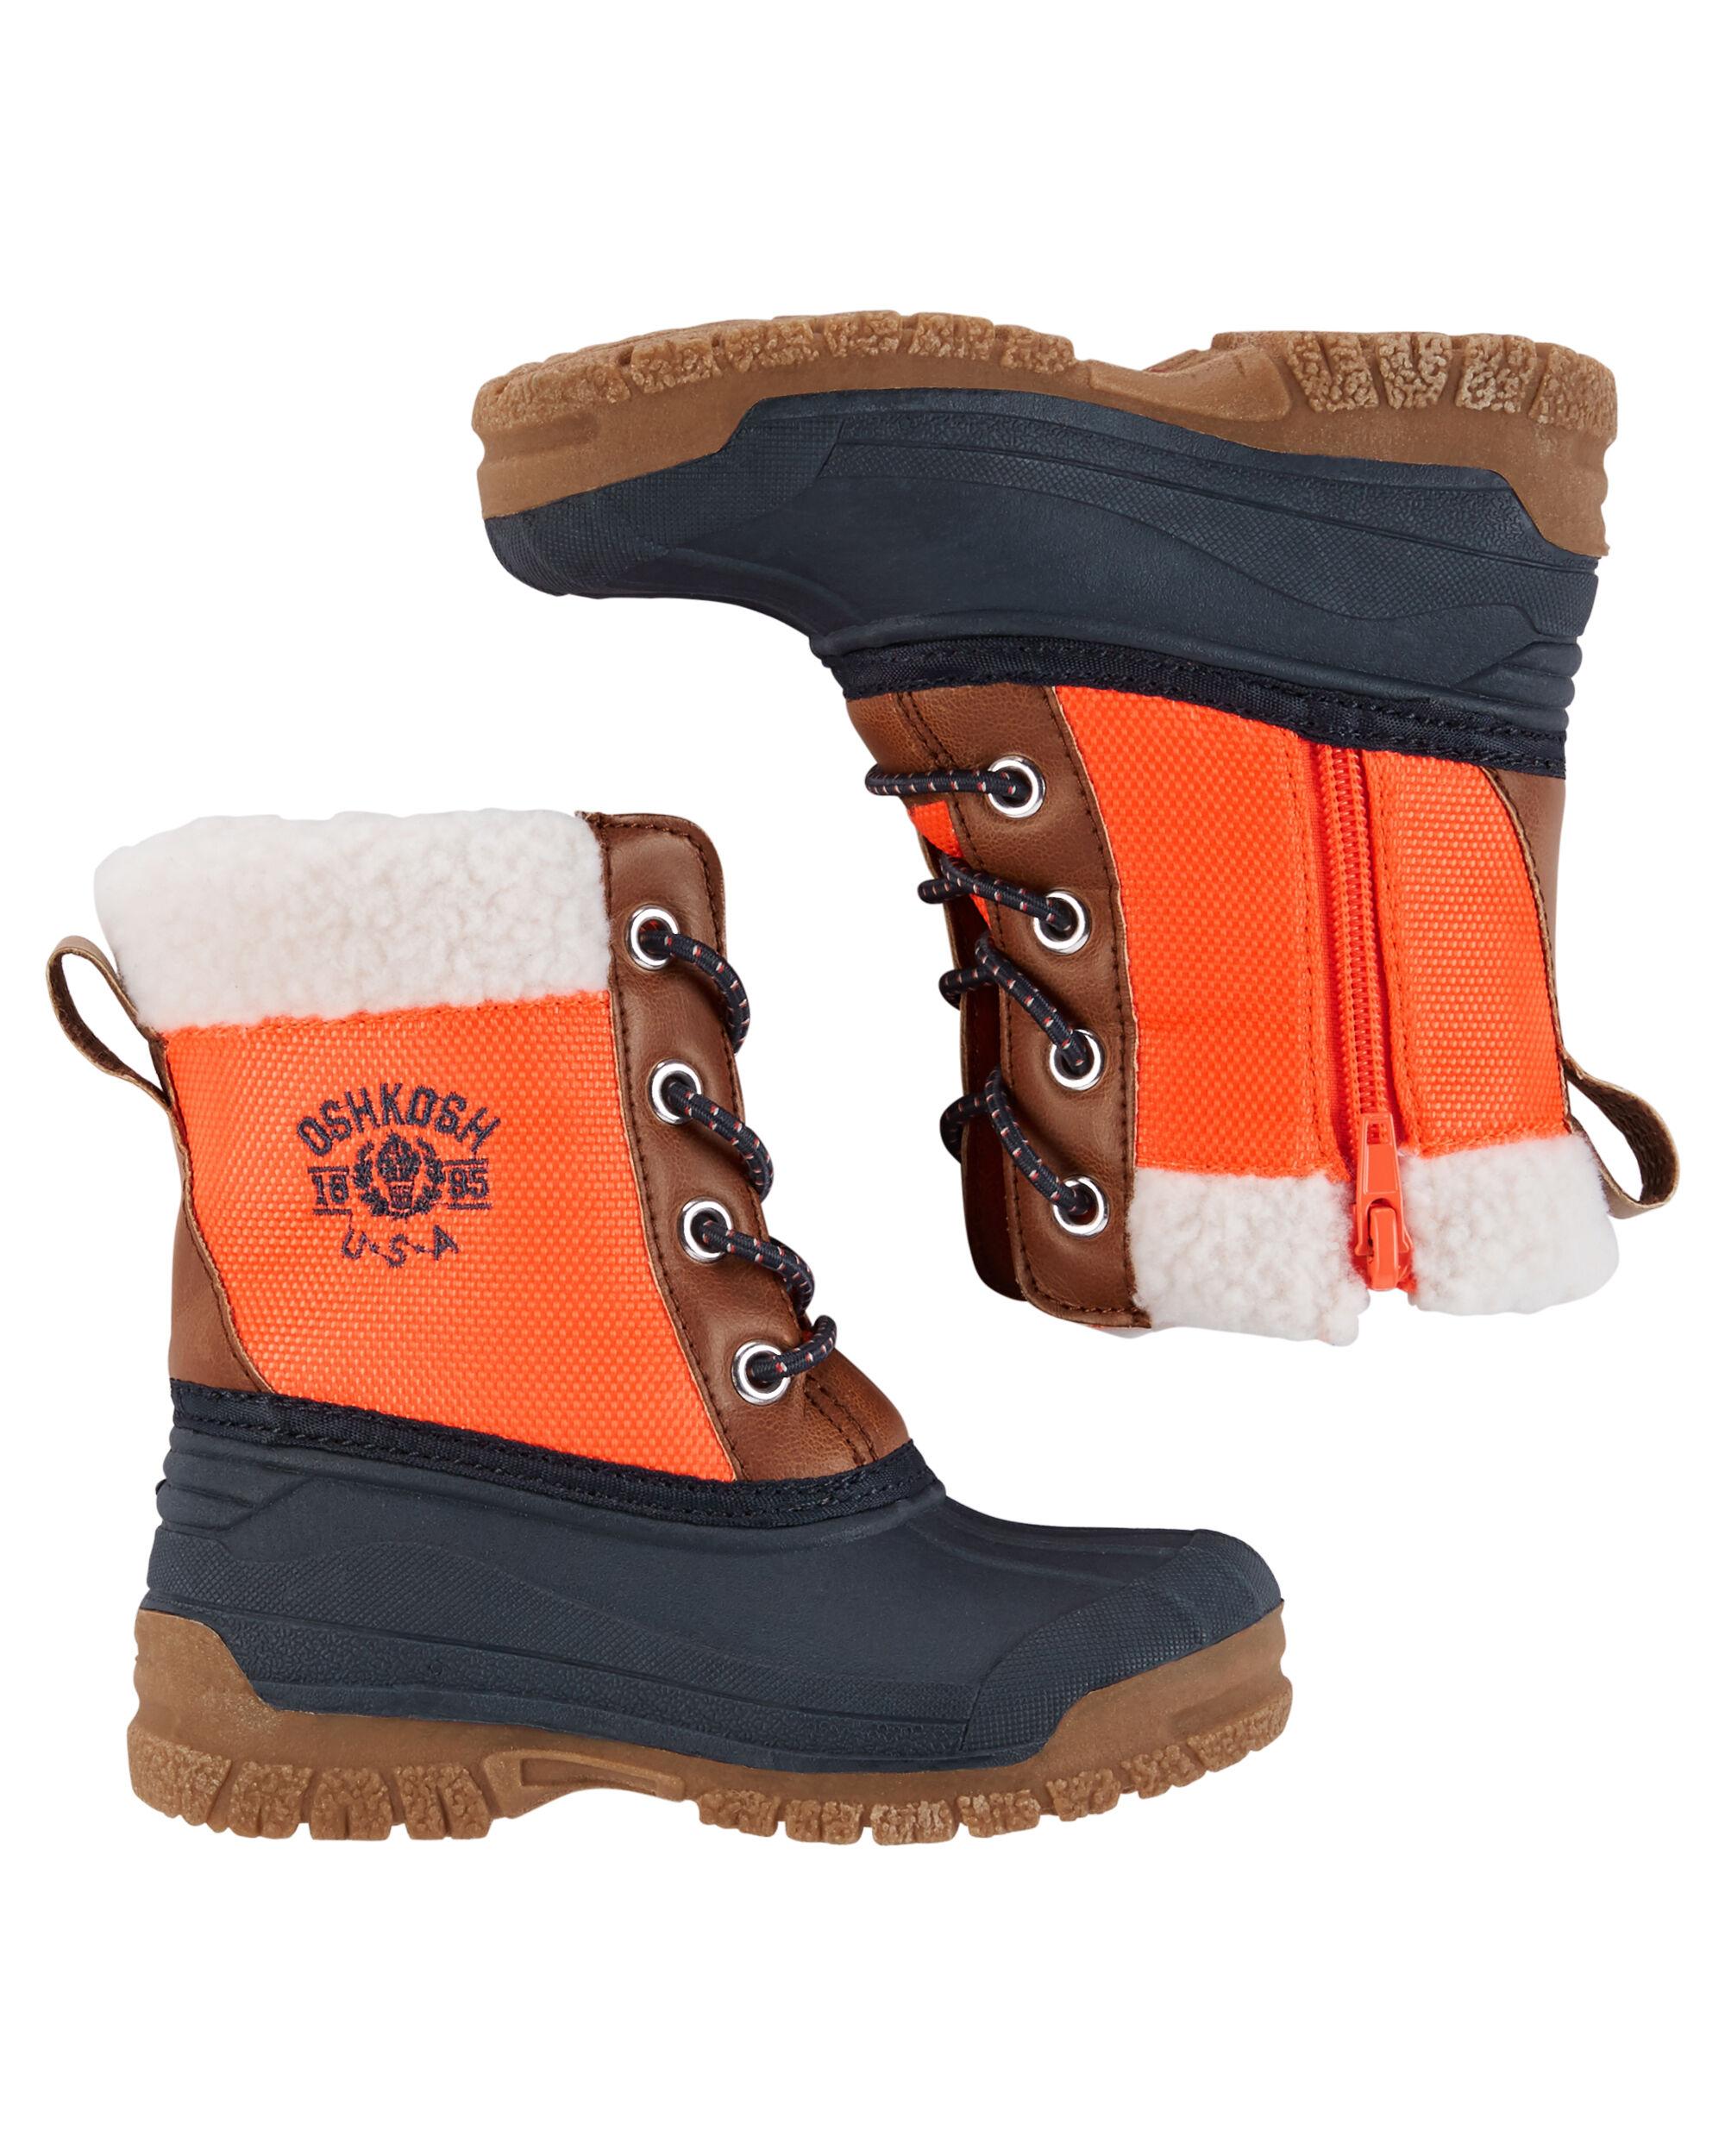 ff99d73c7 OshKosh Snow Boots